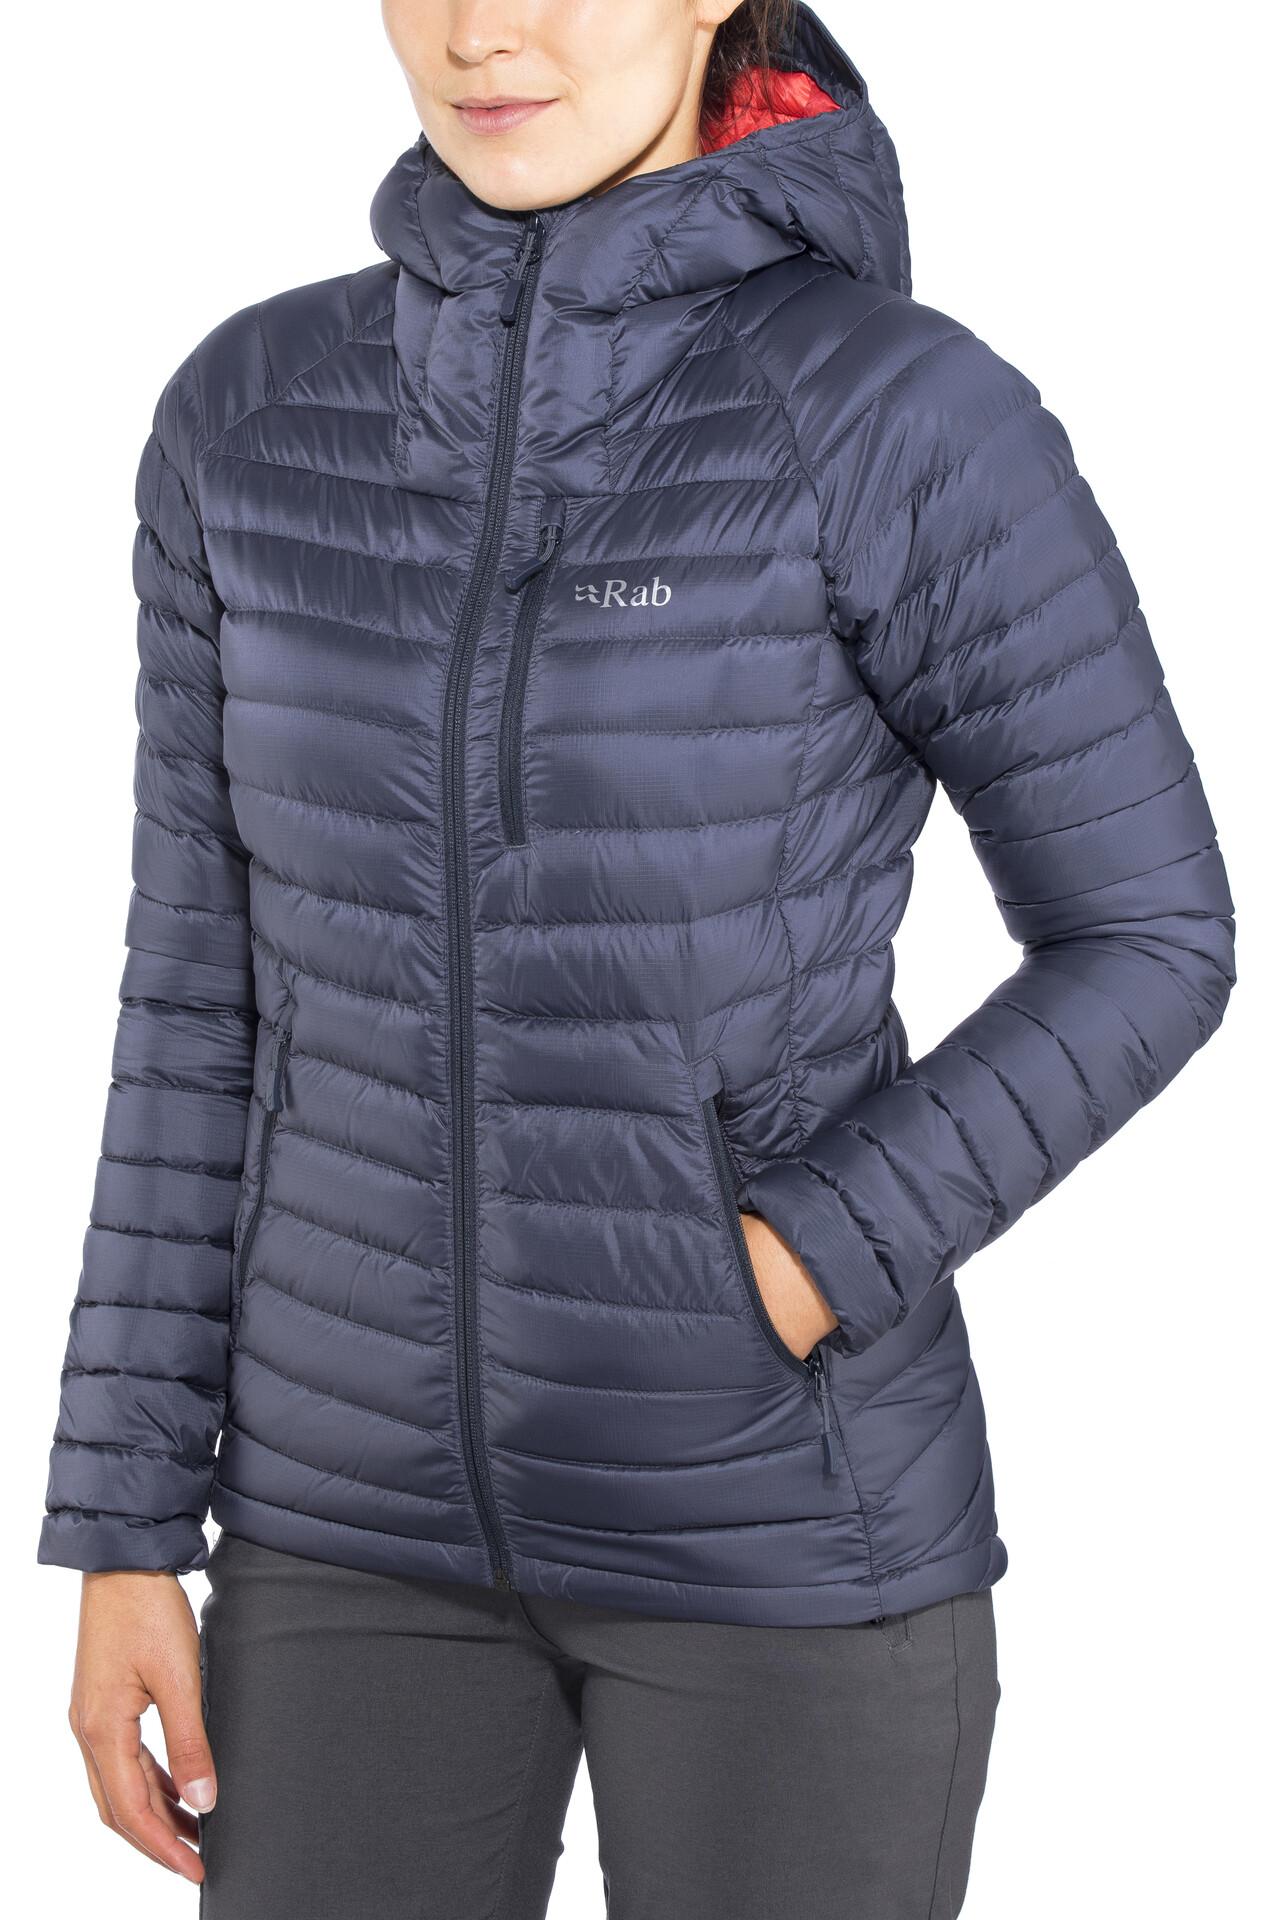 Rab Microlight Alpine Long Jacket Damen steelpassata